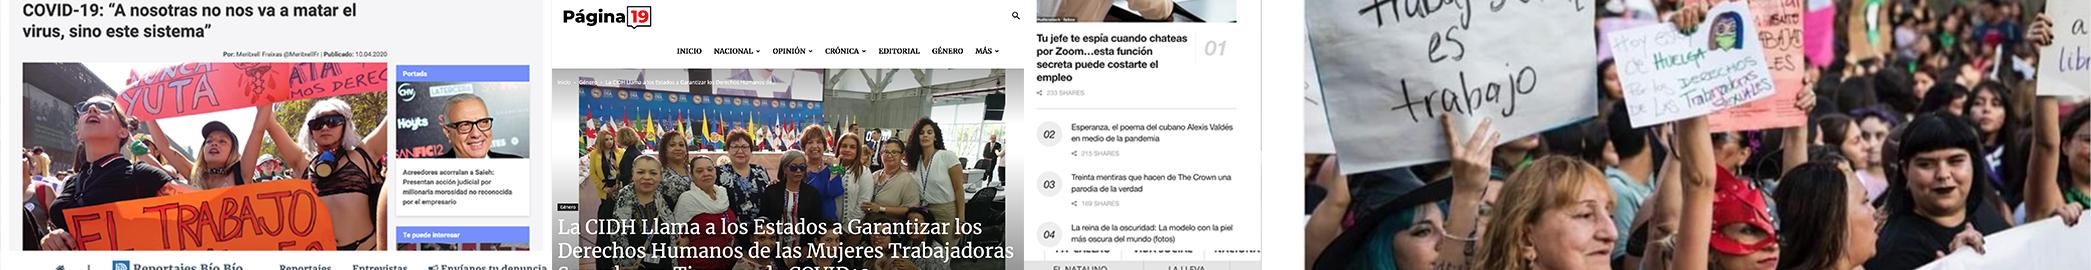 franjaNoticias